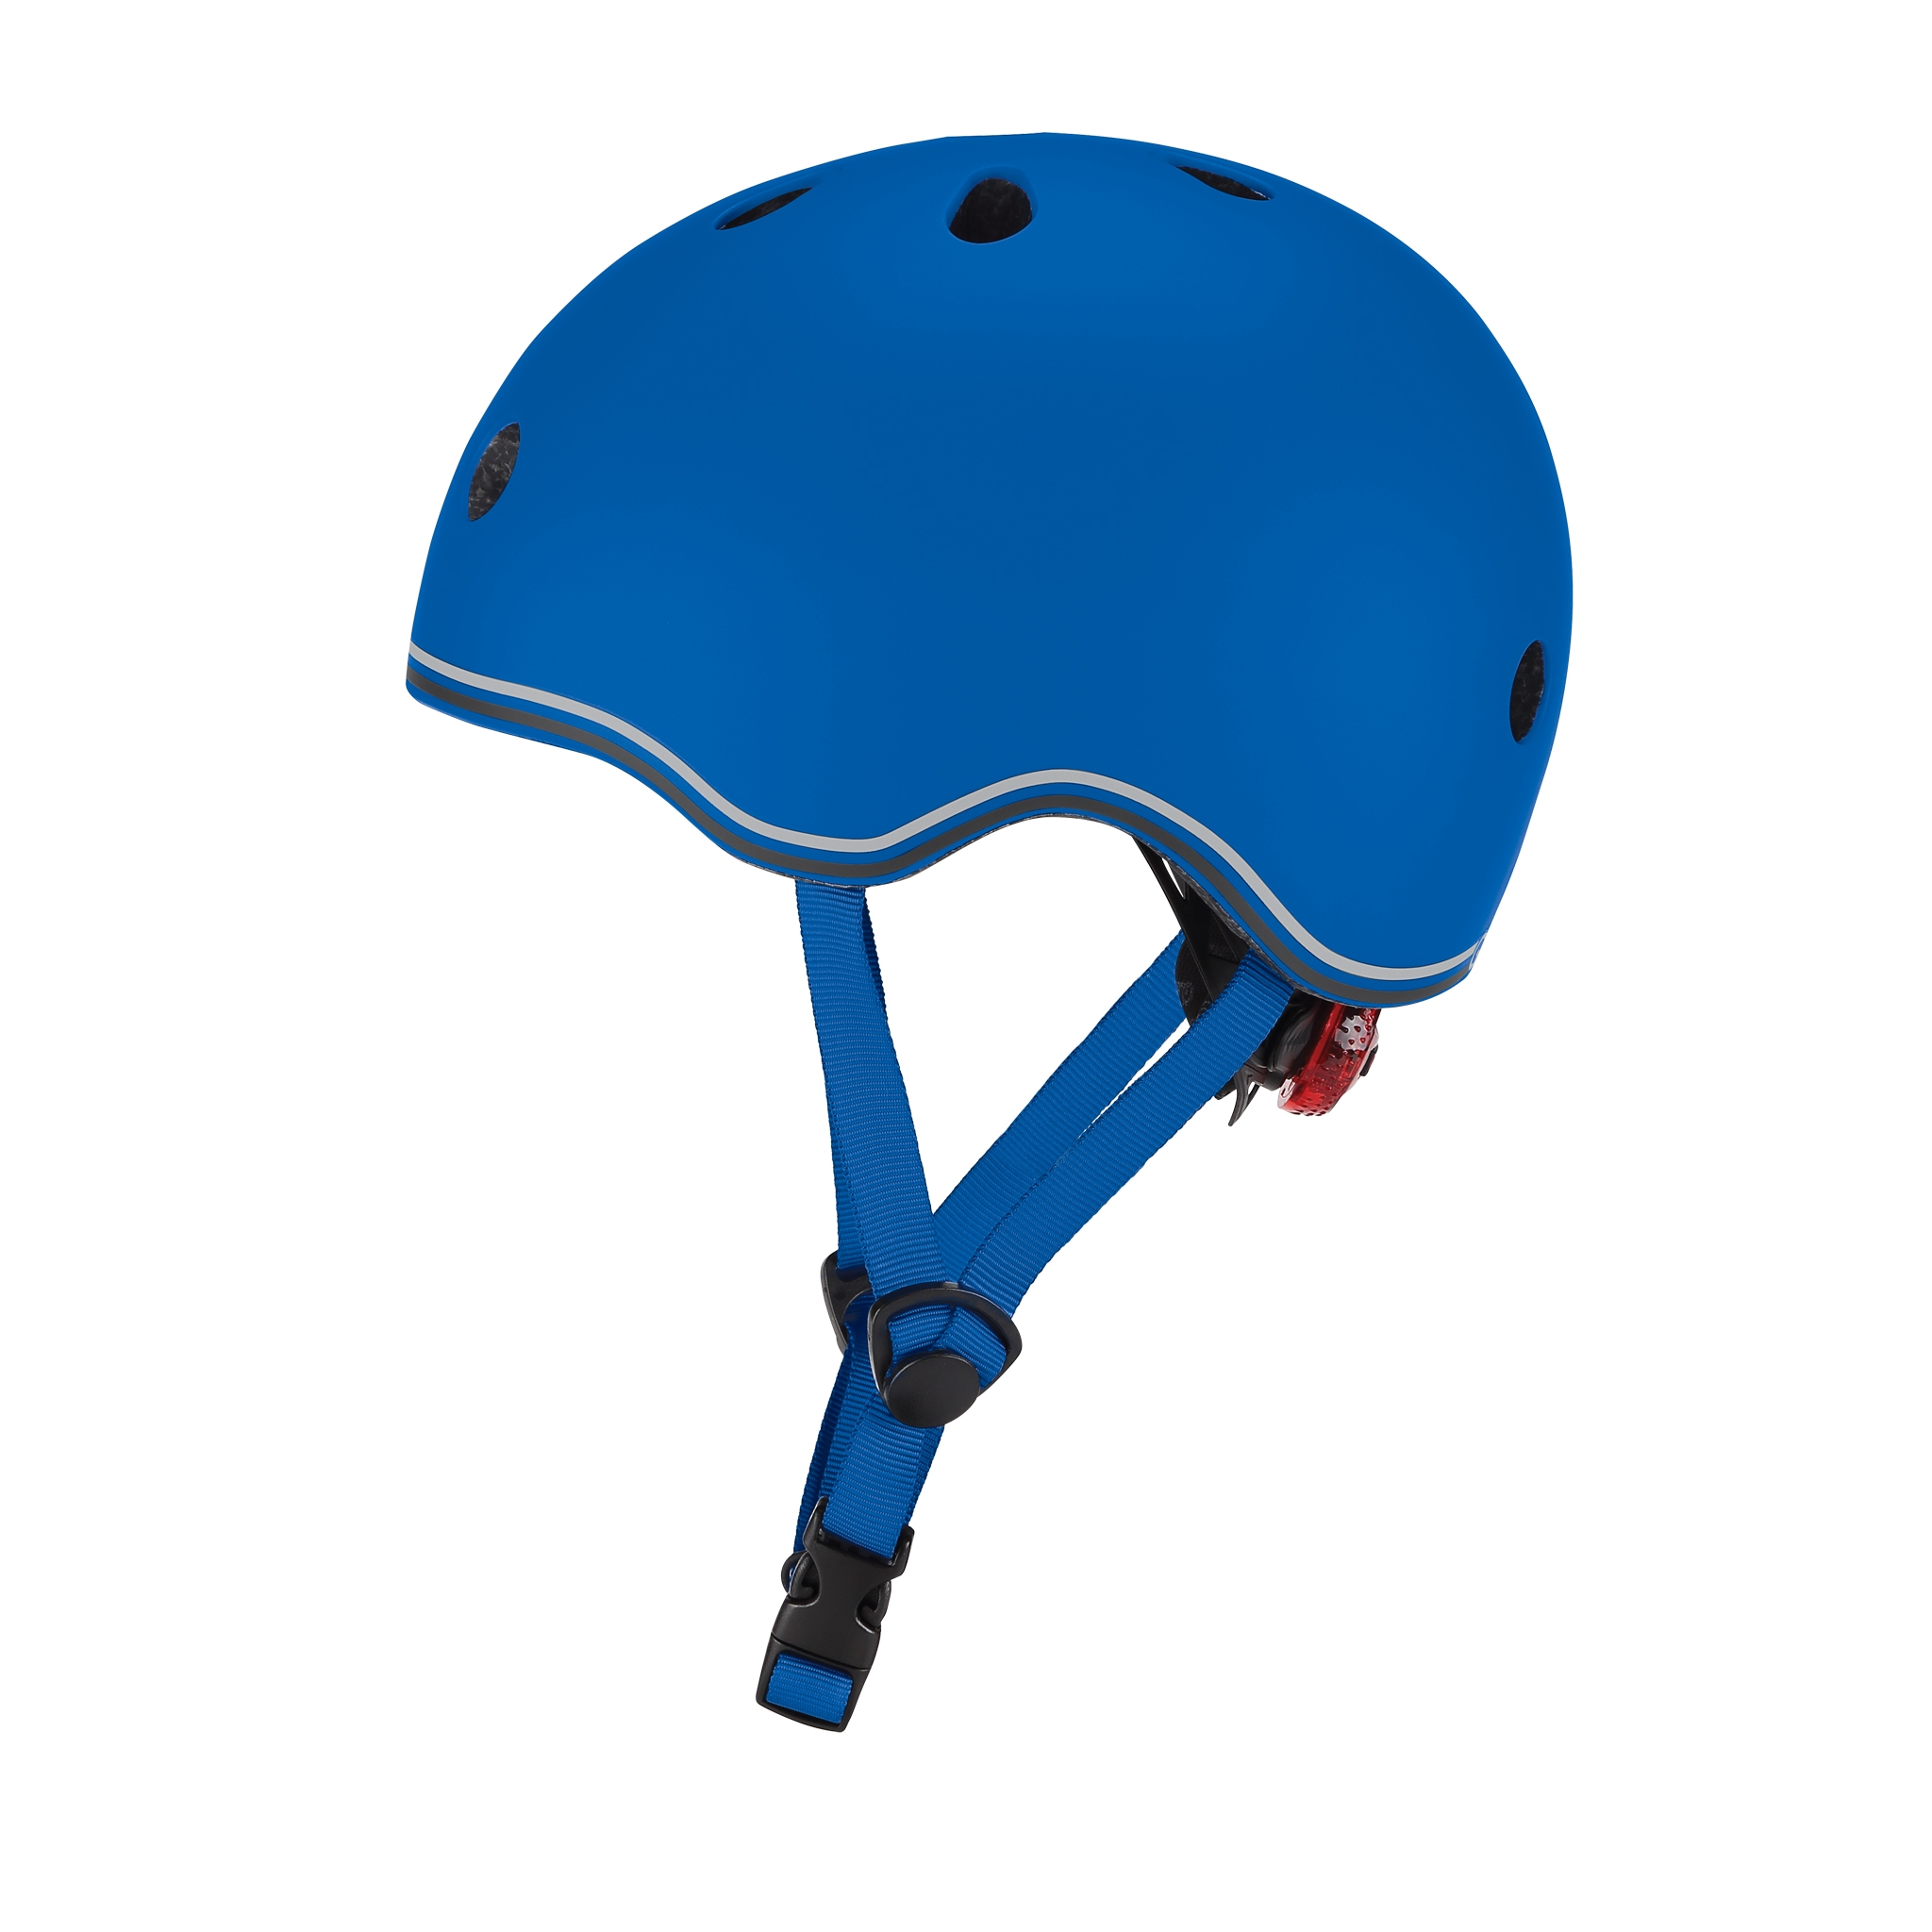 EVO-helmets-scooter-helmets-for-toddlers-with-adjustable-helmet-knob-navy-blue 1